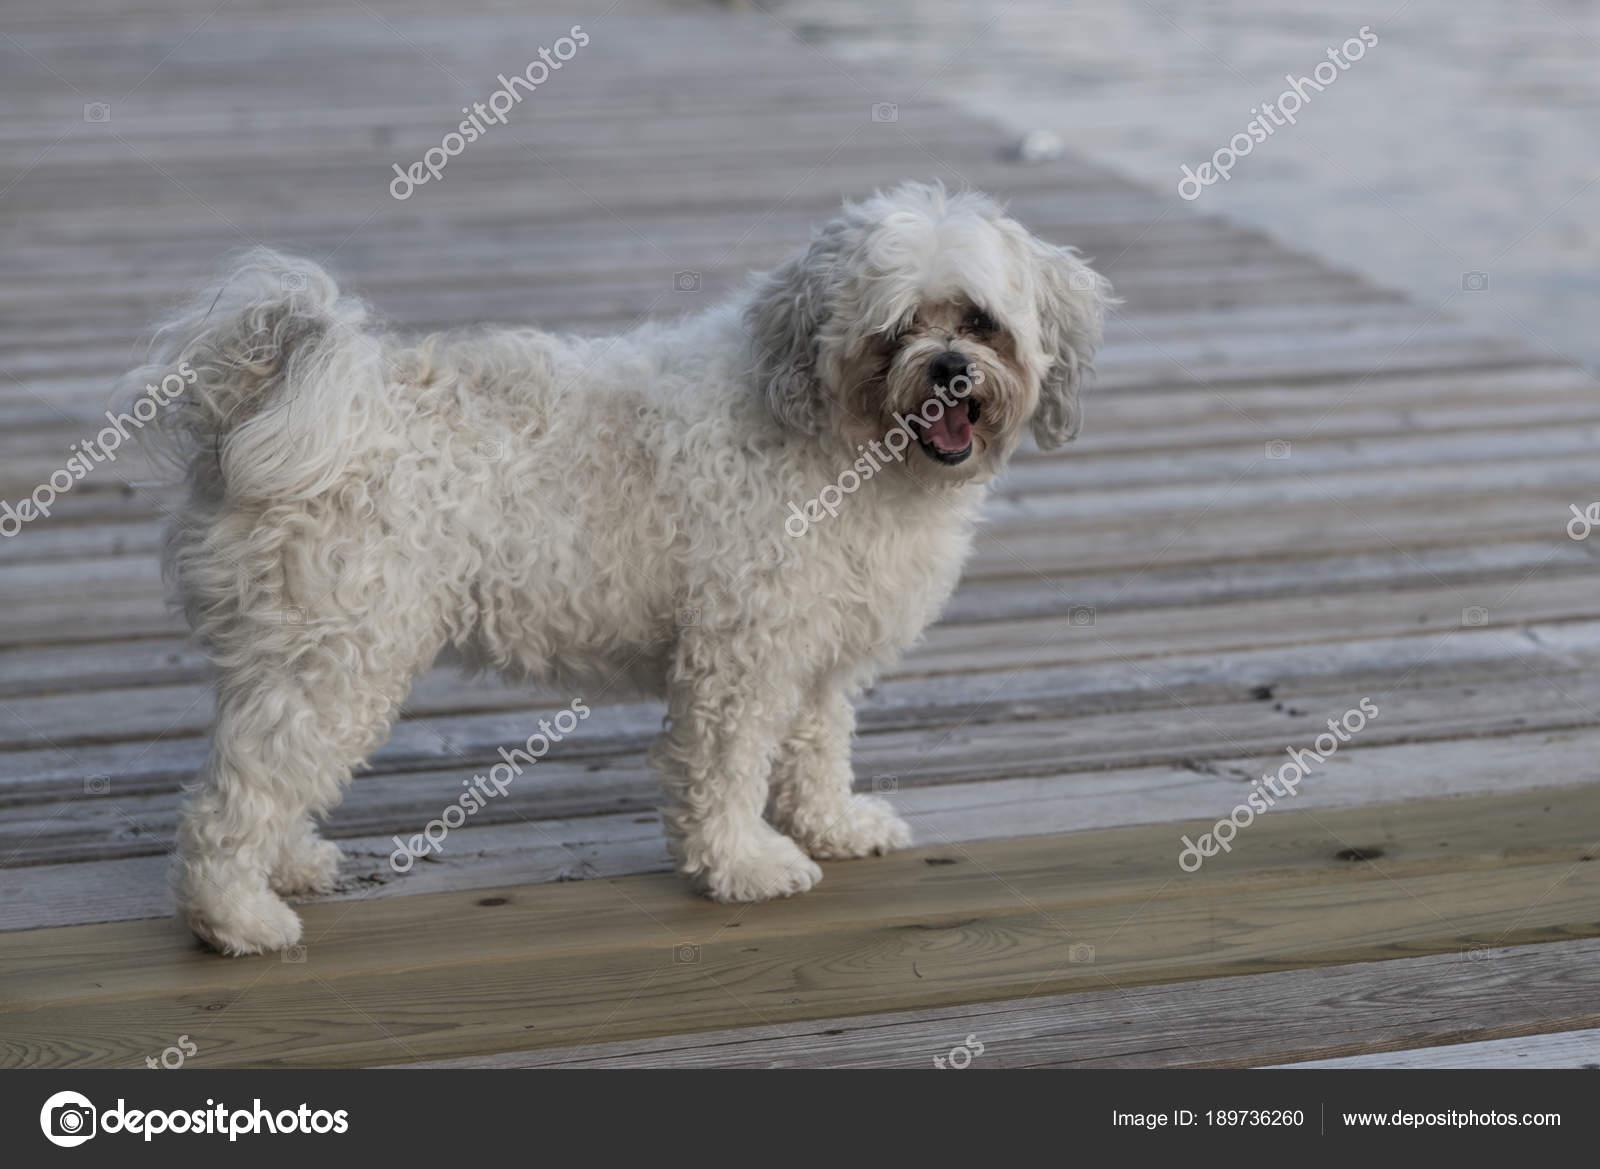 White Zuchon Puppy Lake Woods Ontario Canada Stock Photo